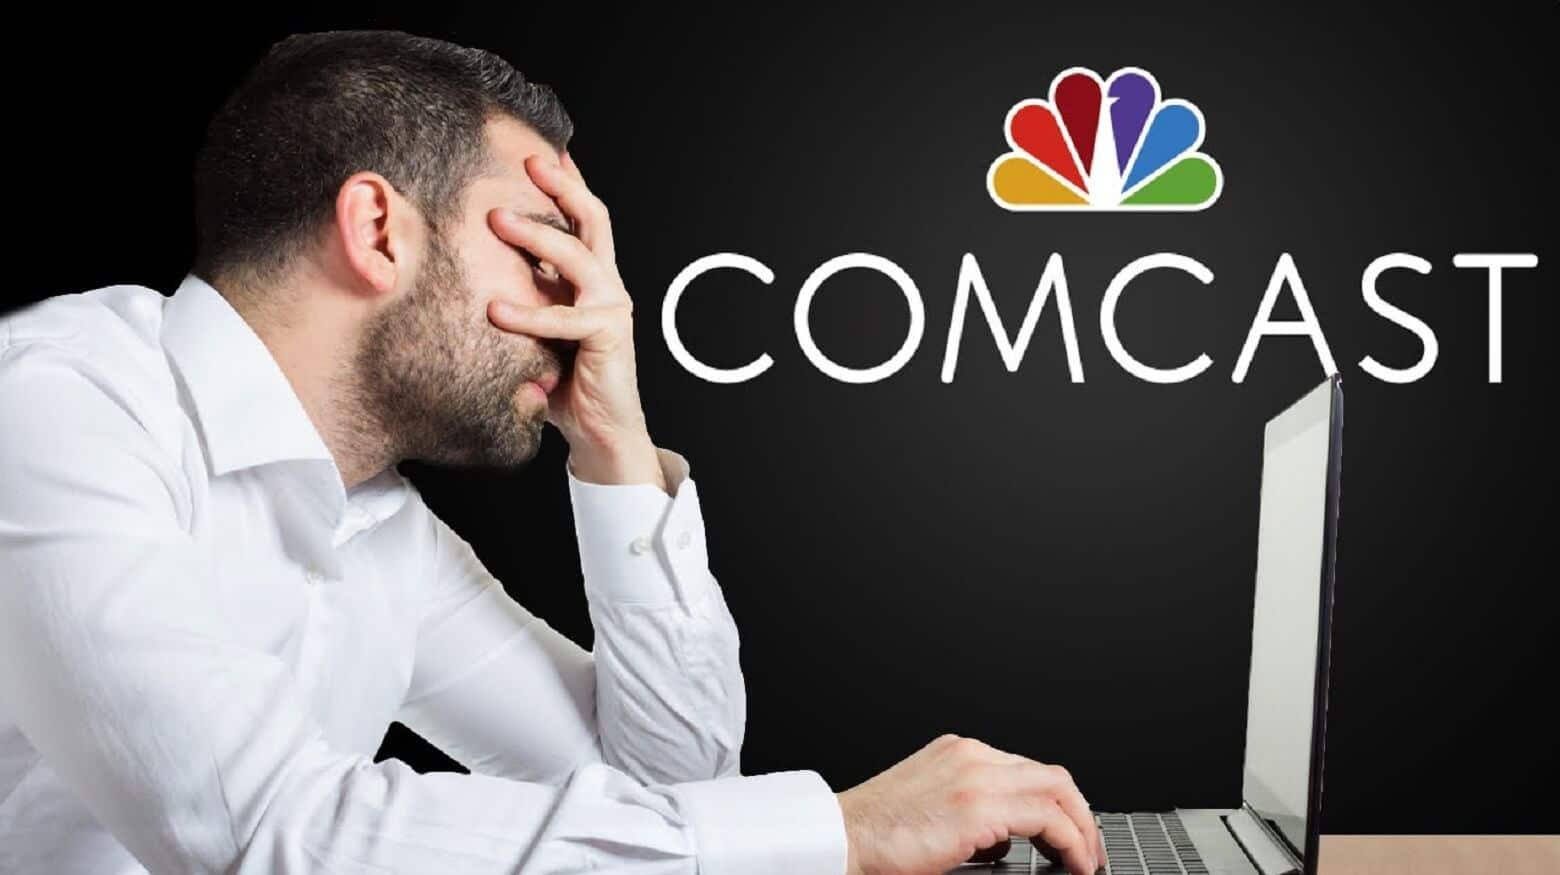 comcast assholes